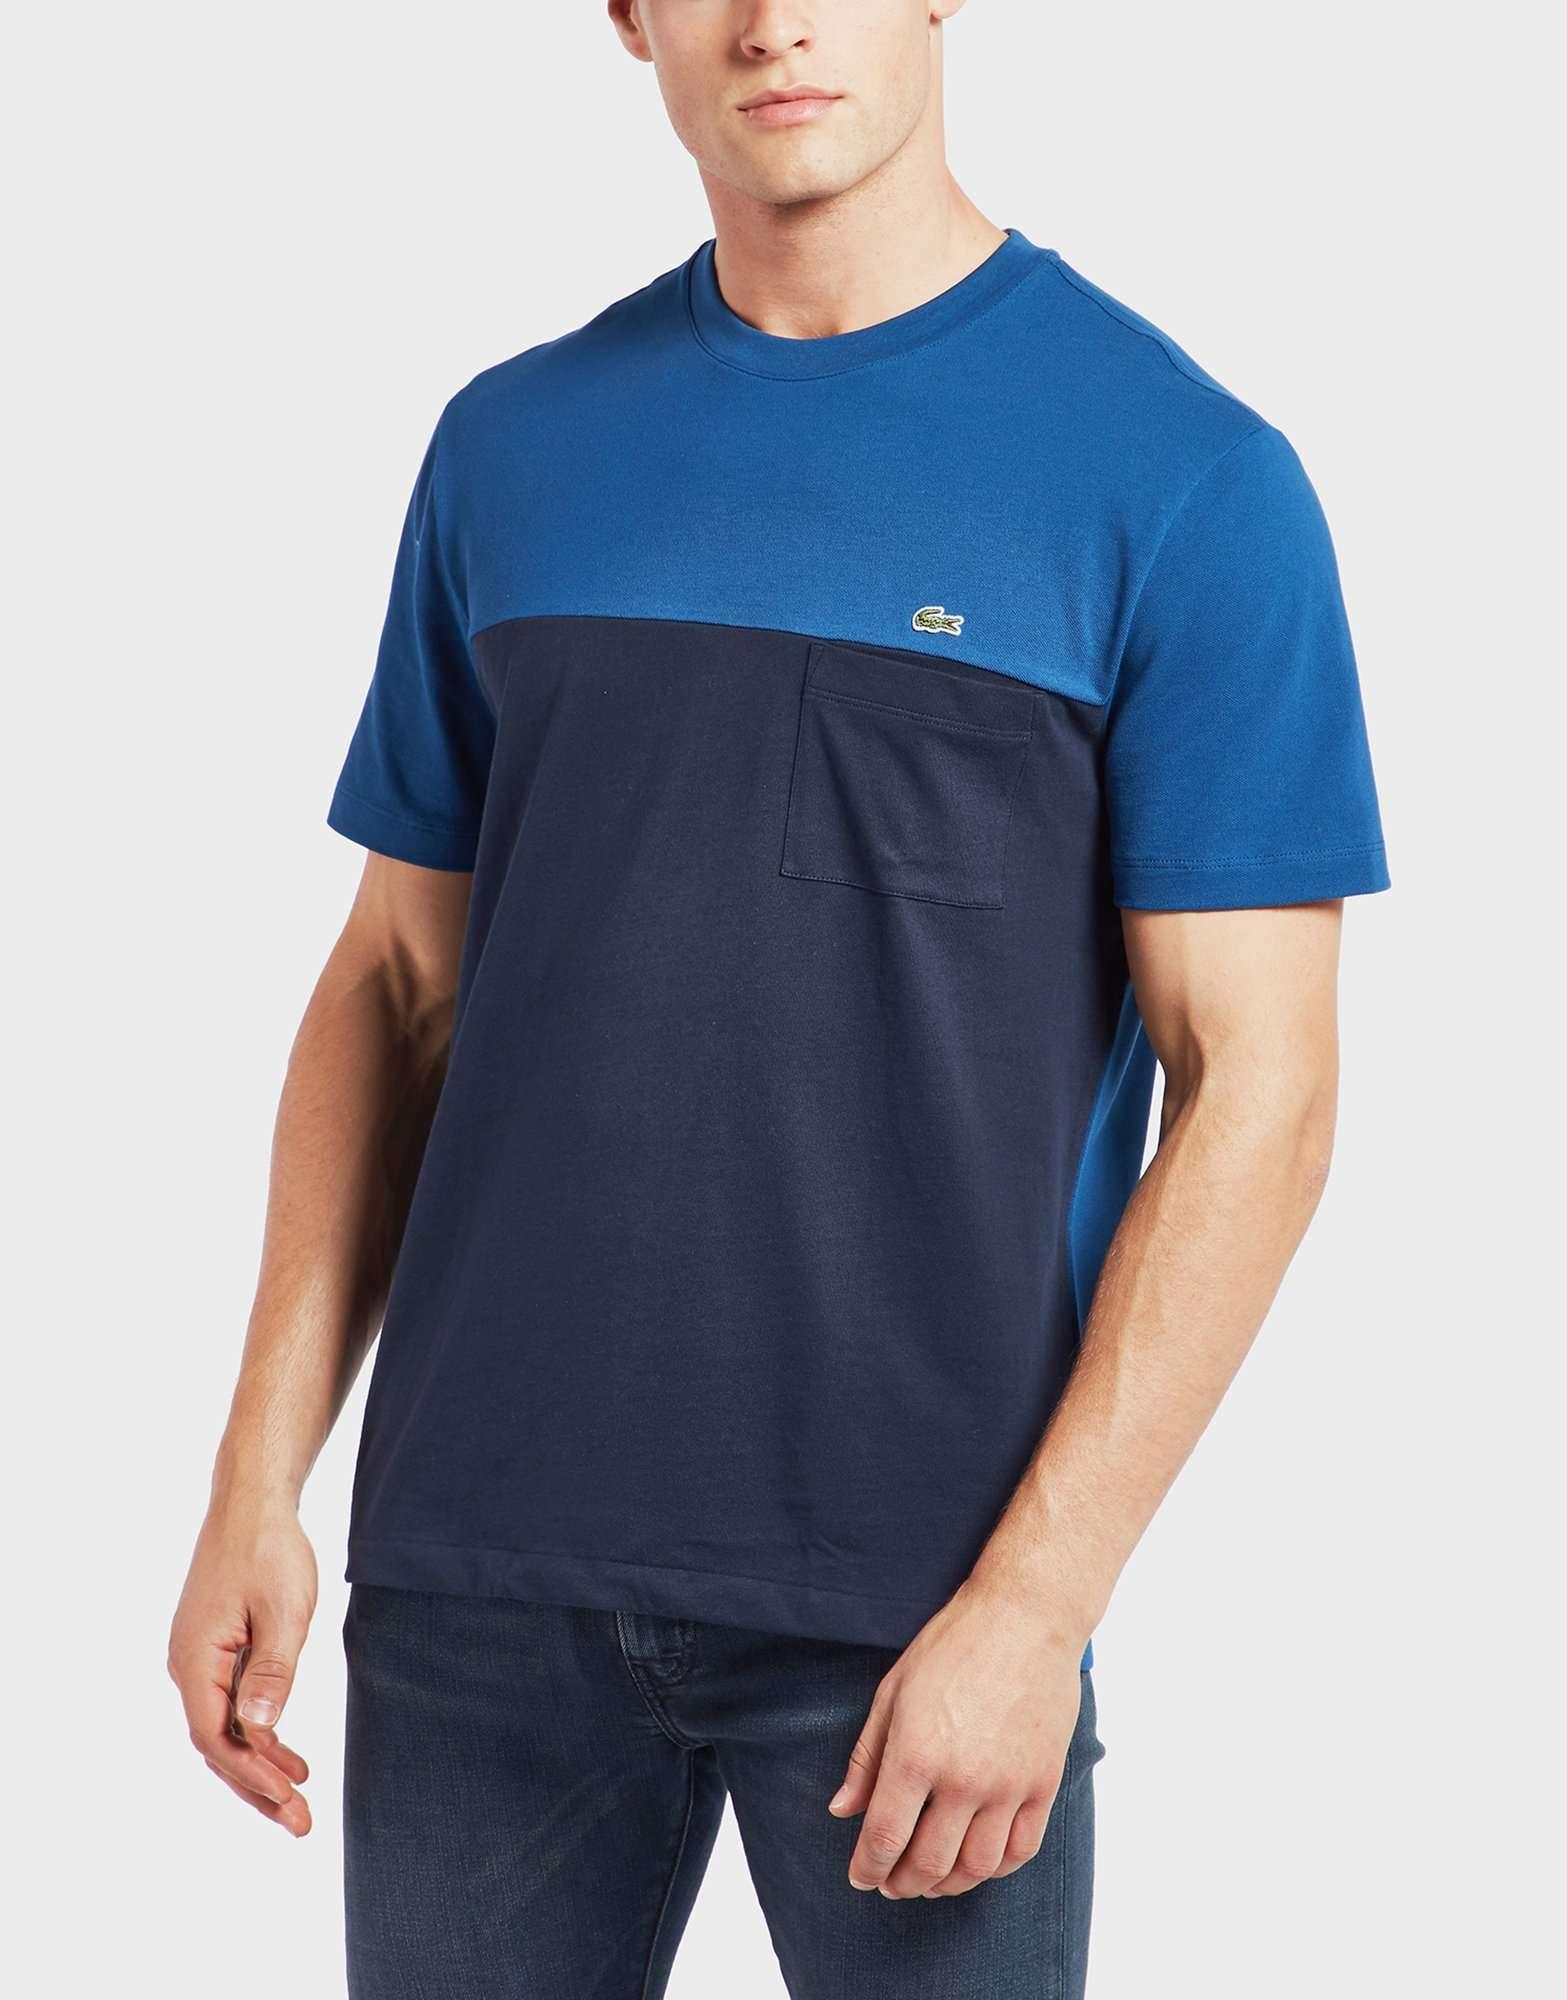 Lacoste Block Pocket Short Sleeve T-Shirt